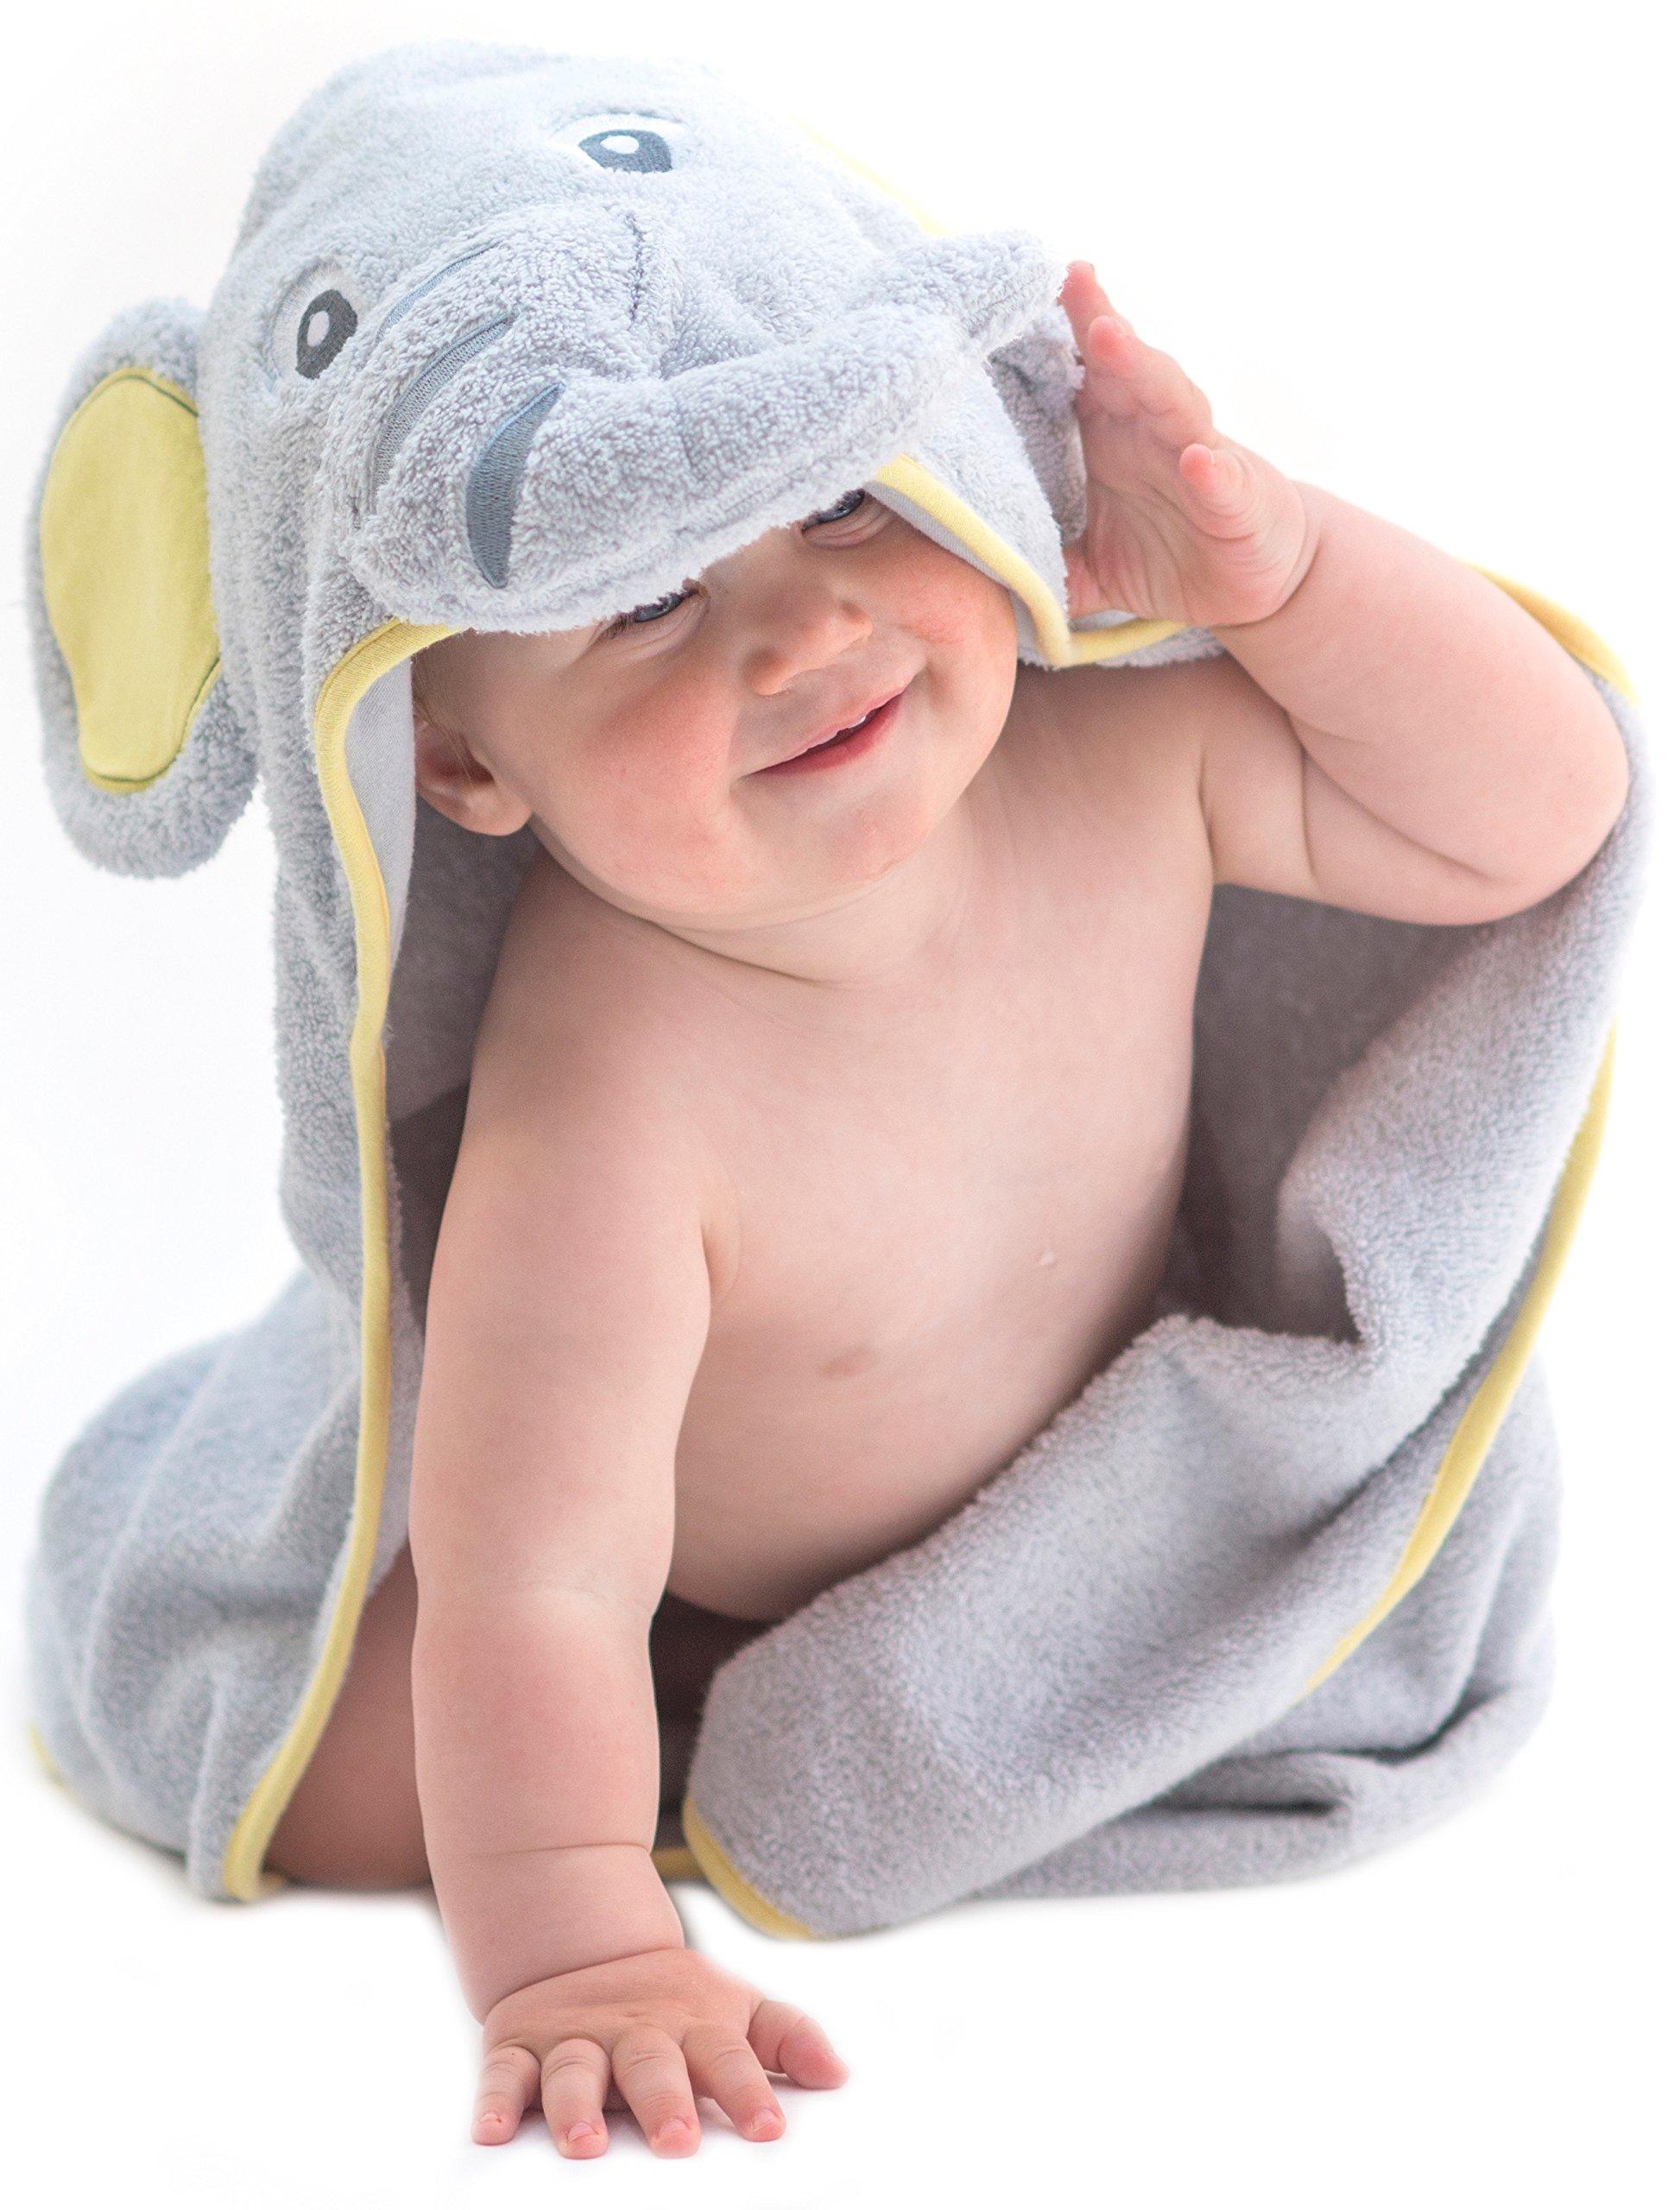 Little Tinkers World Toalla de bebé con capucha de elefante EXTRA SUAVE - Toalla de baño